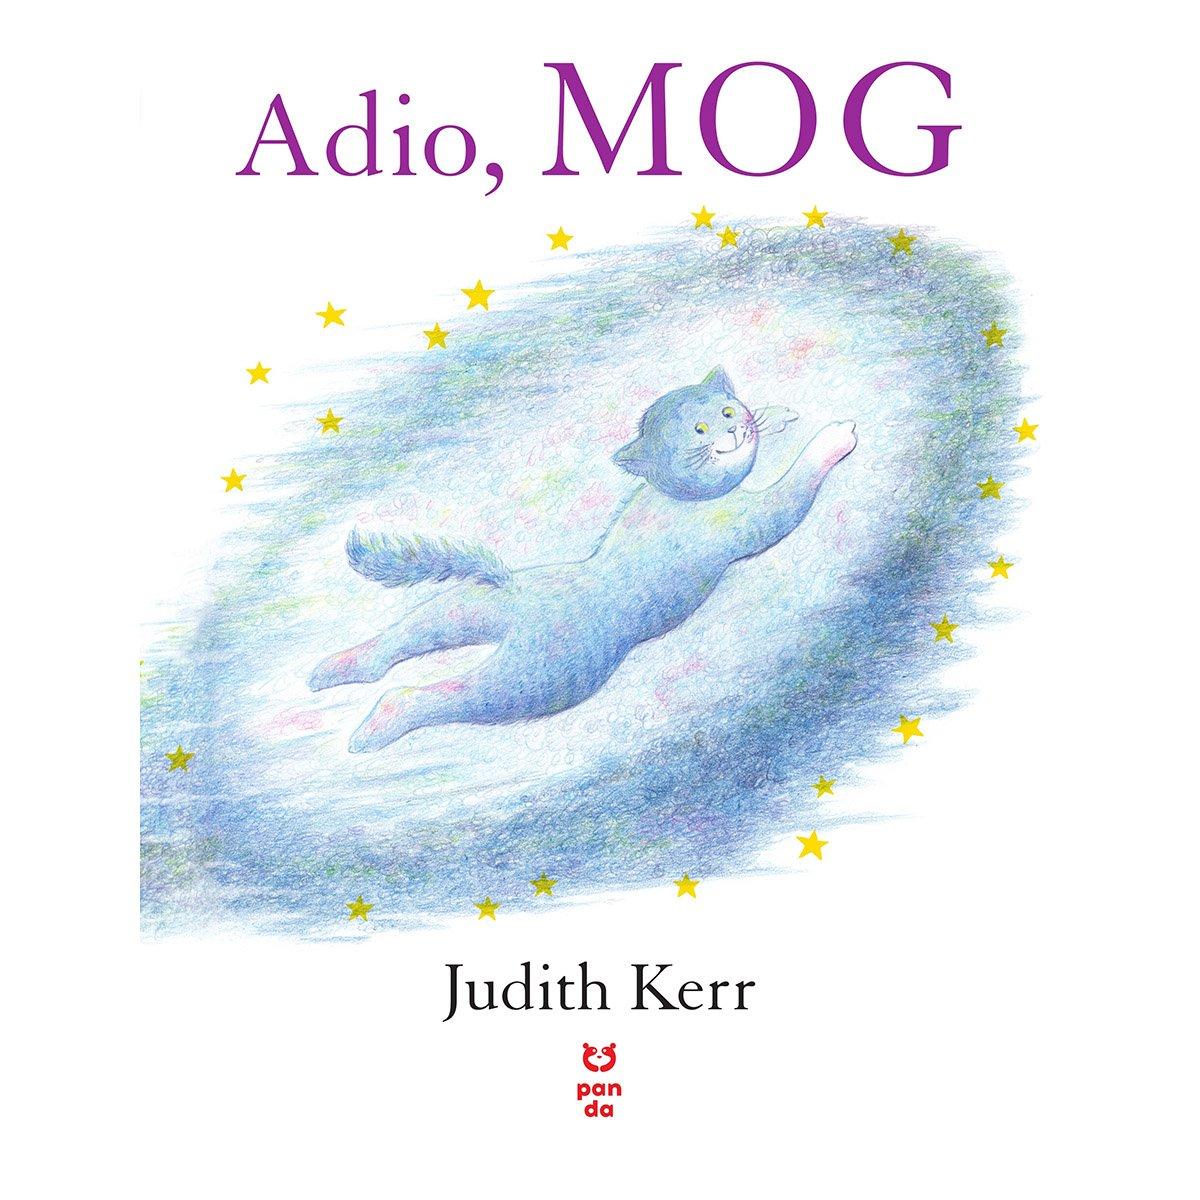 Carte Editura Pandora M, Adio, MOG, Judith Kerr